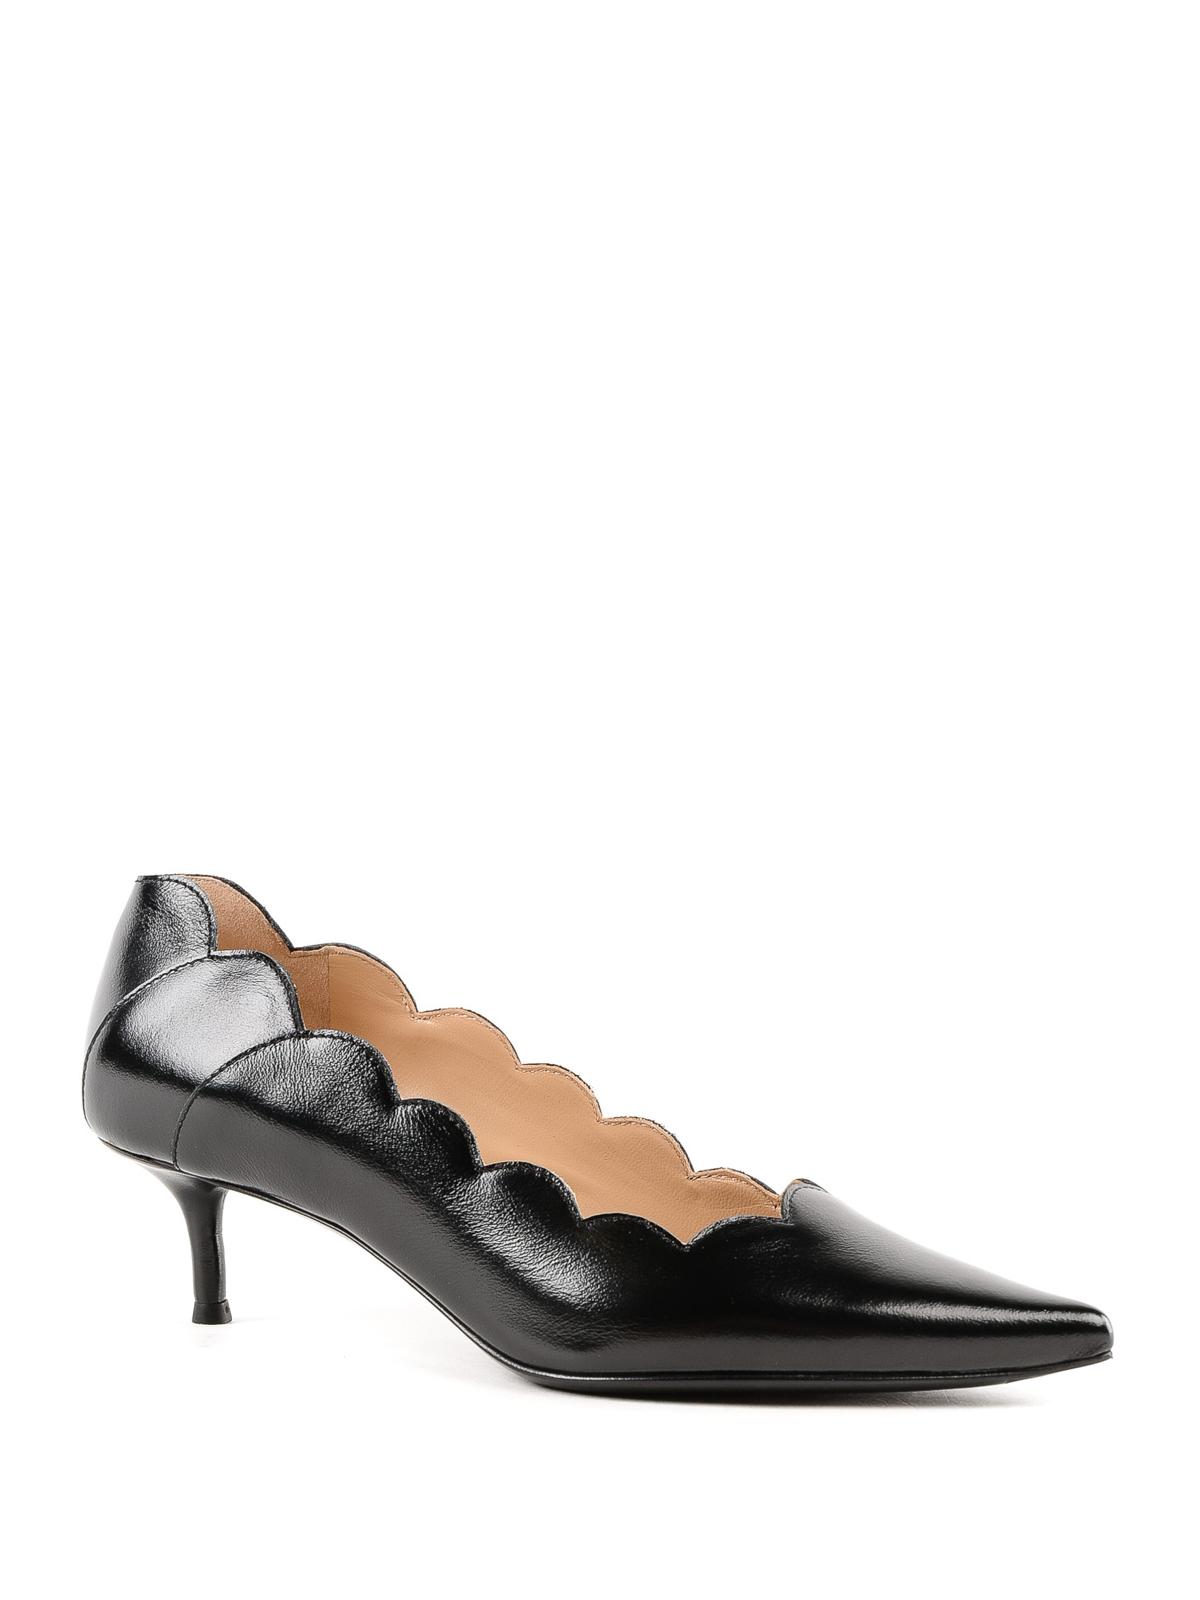 9cd507bb0025 Lauren polished leather scalloped pumps shop online  CHLOE · CHLOE · CHLOE  · CHLOE